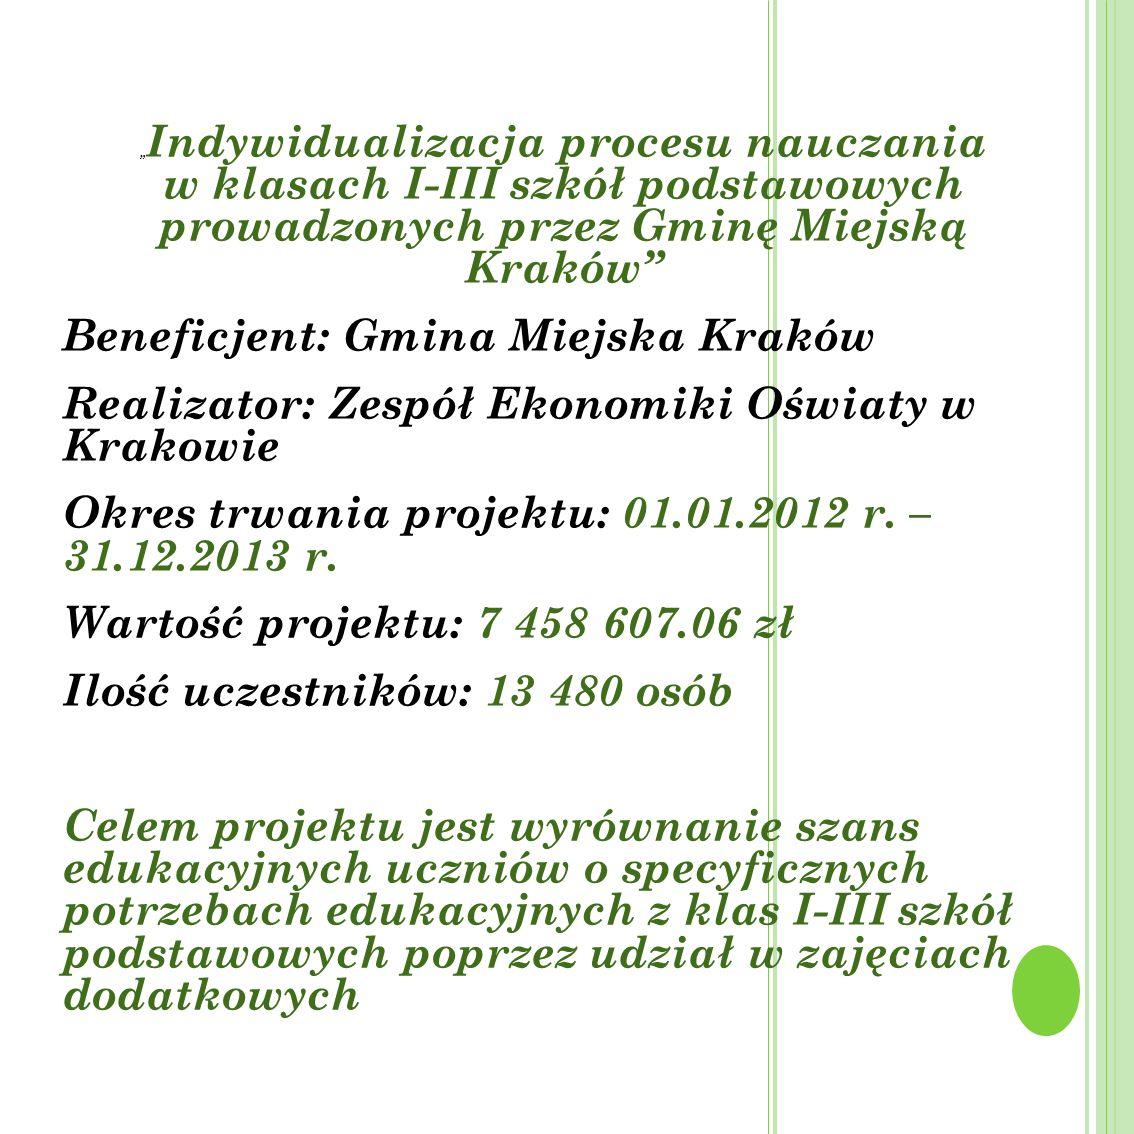 Beneficjent: Gmina Miejska Kraków